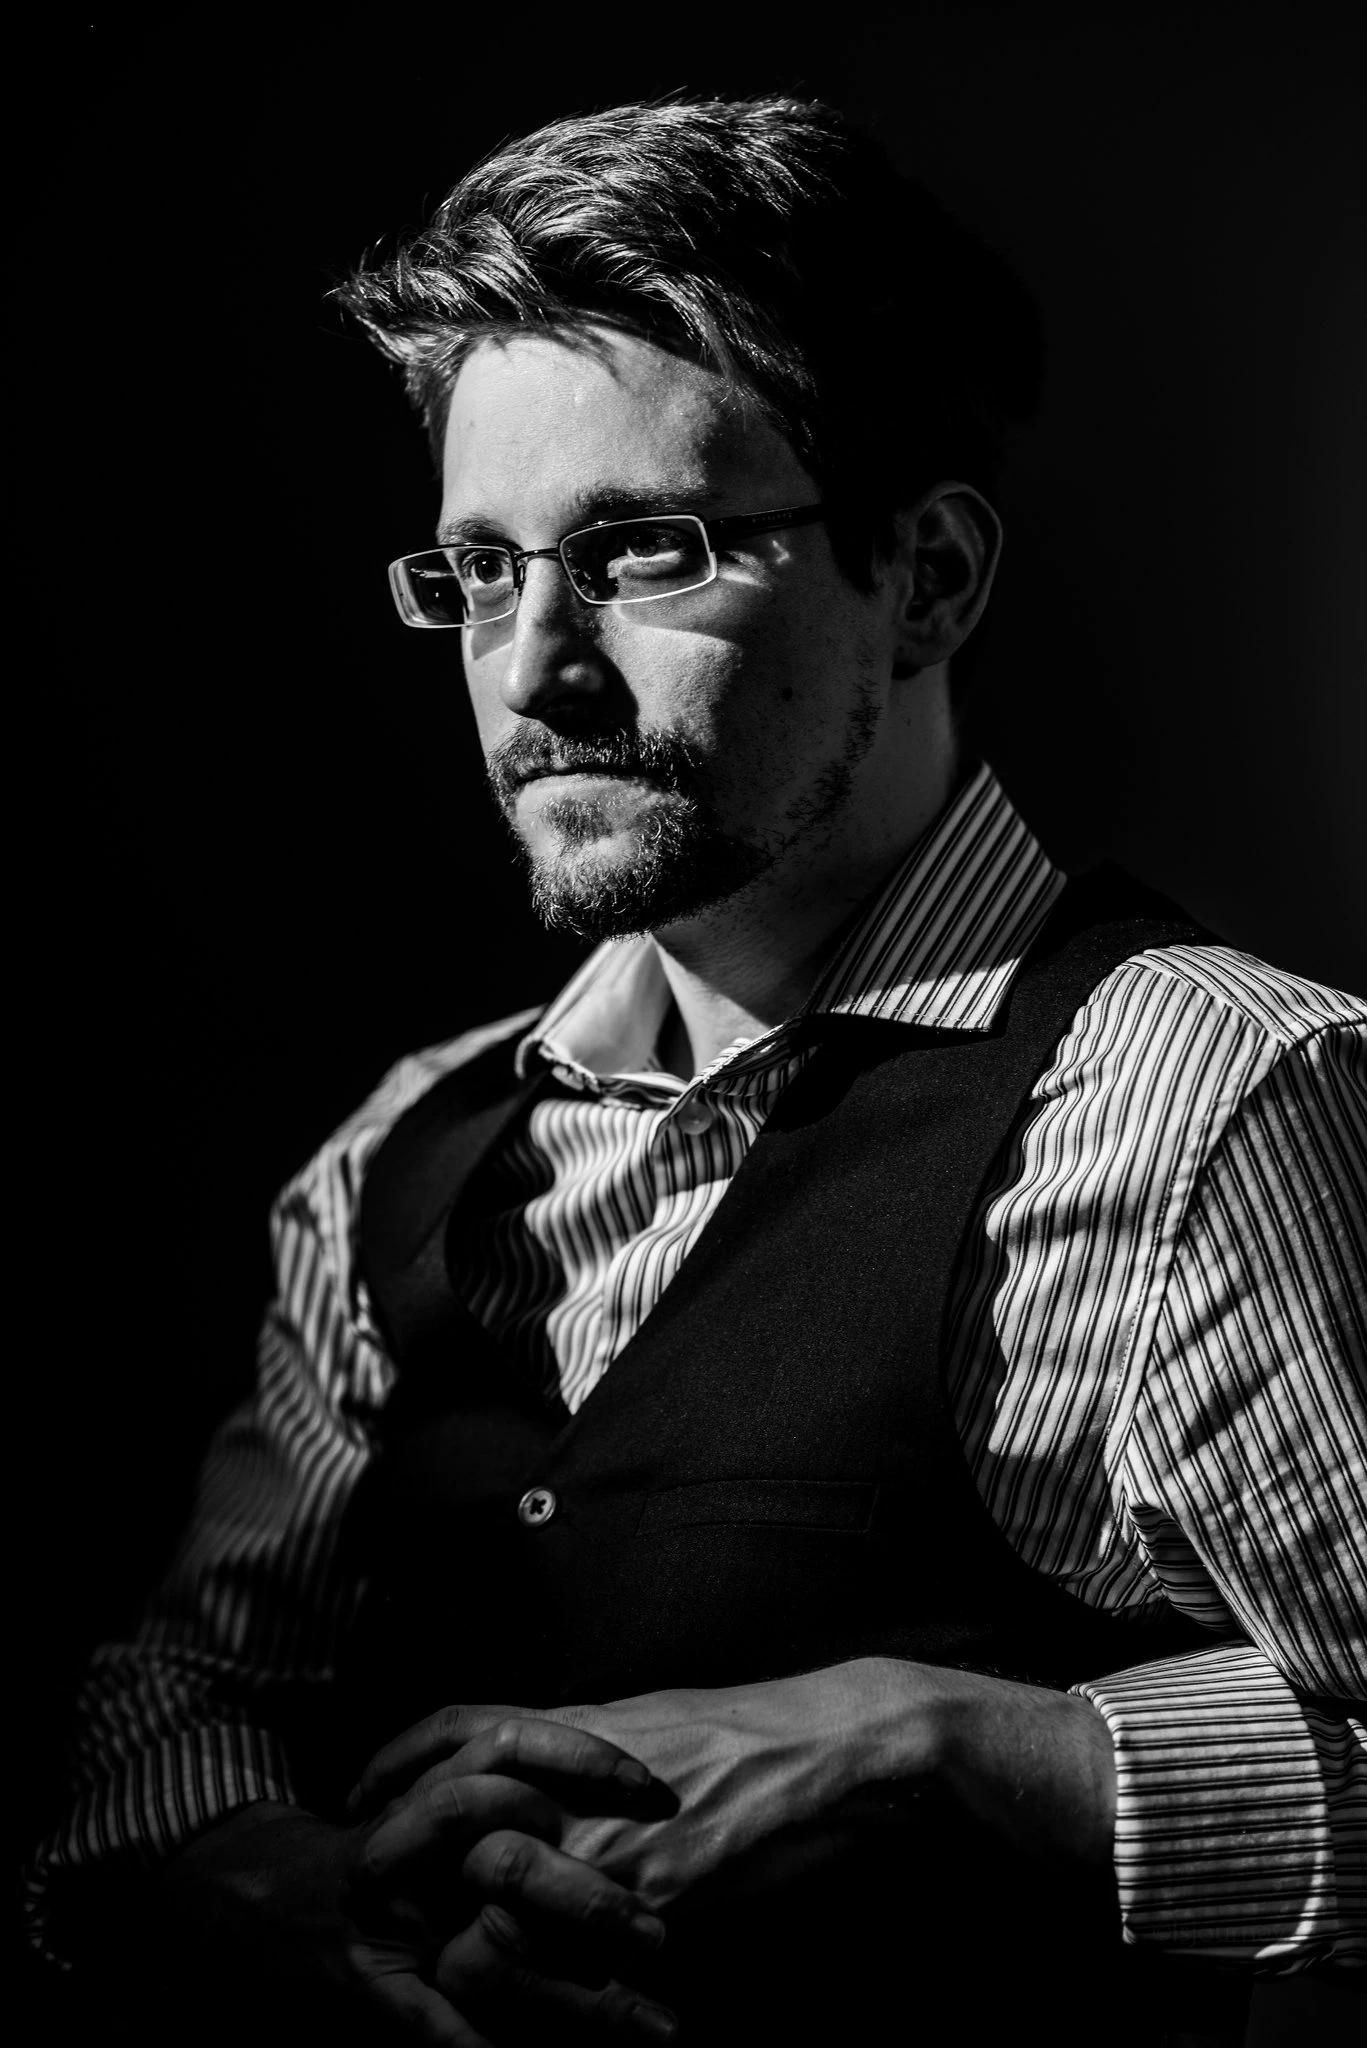 Permanent records - Edward Snowden